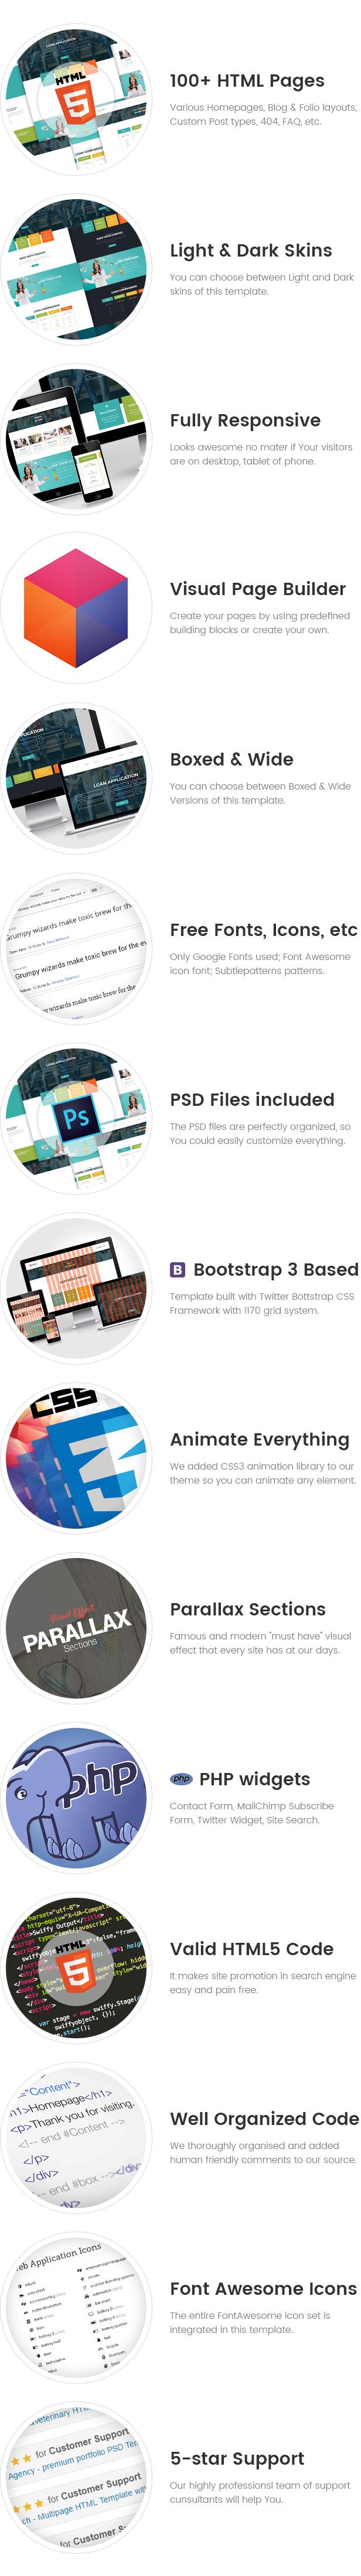 CashGo - Fast Cash Loan Company HTML Template